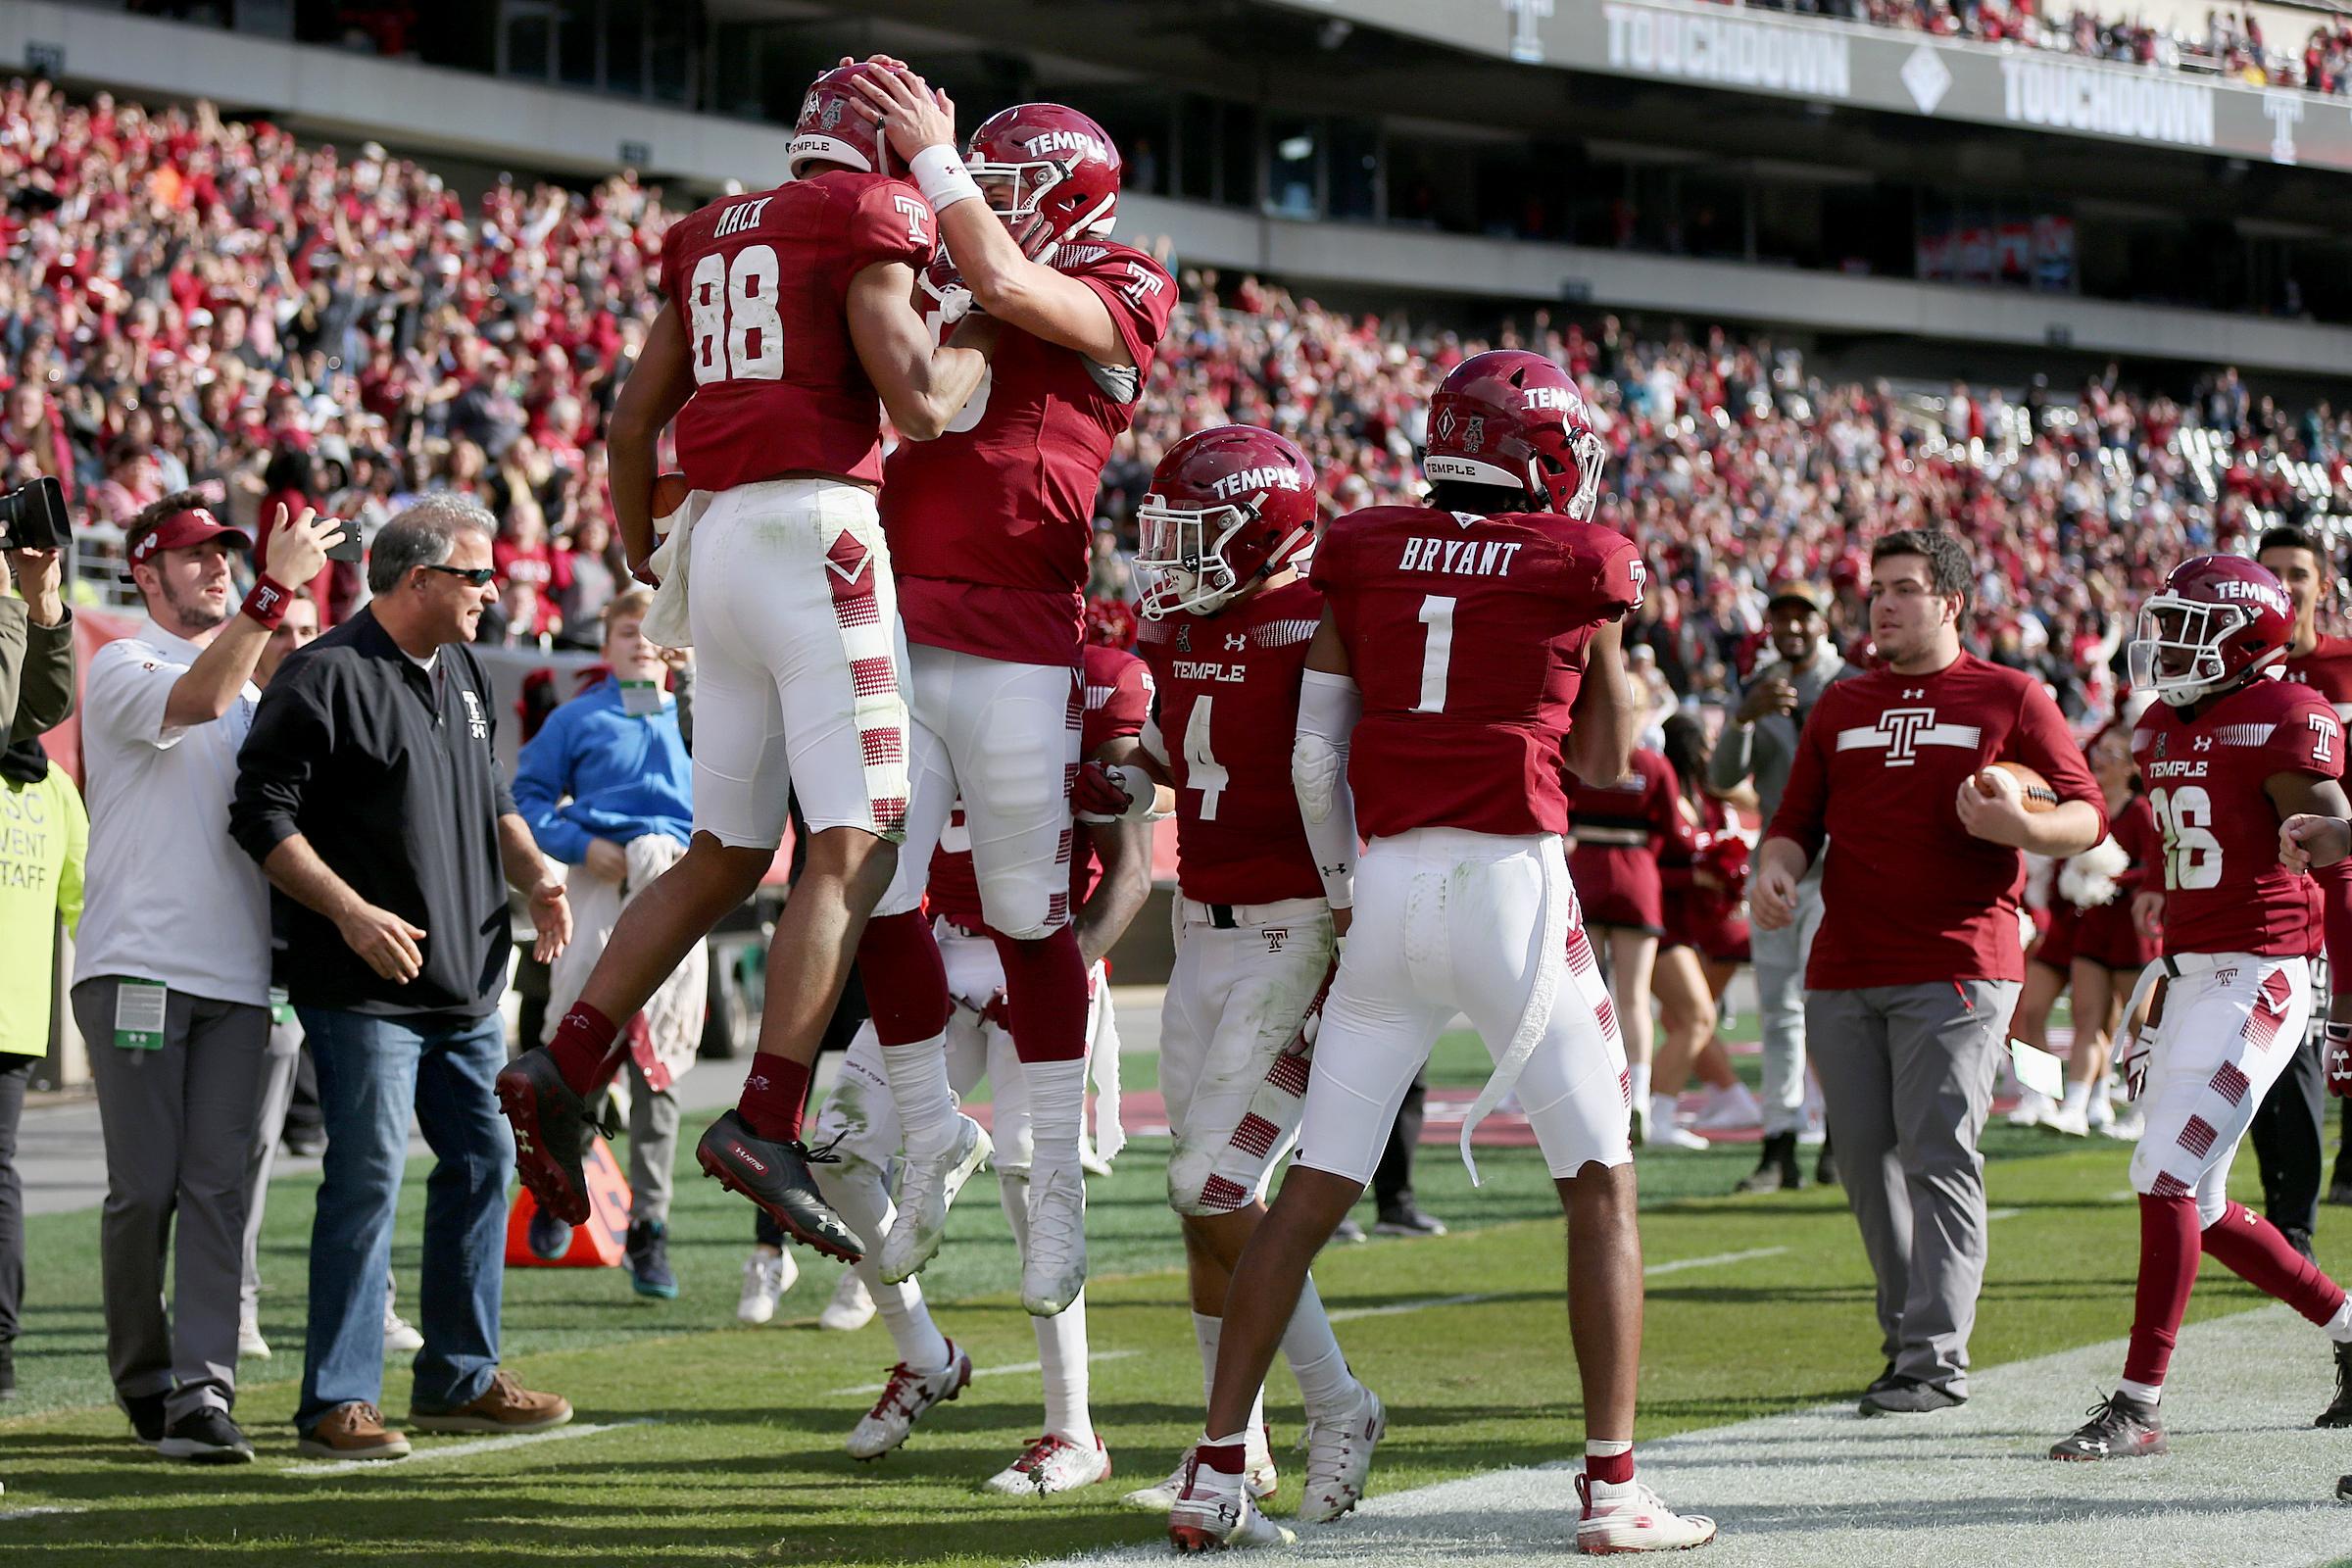 Temple wide receiver Branden Mack (88) and quarterback Anthony Russo (15) celebrate after Mack scored a touchdown against Cincinnati in the fourth quarter.